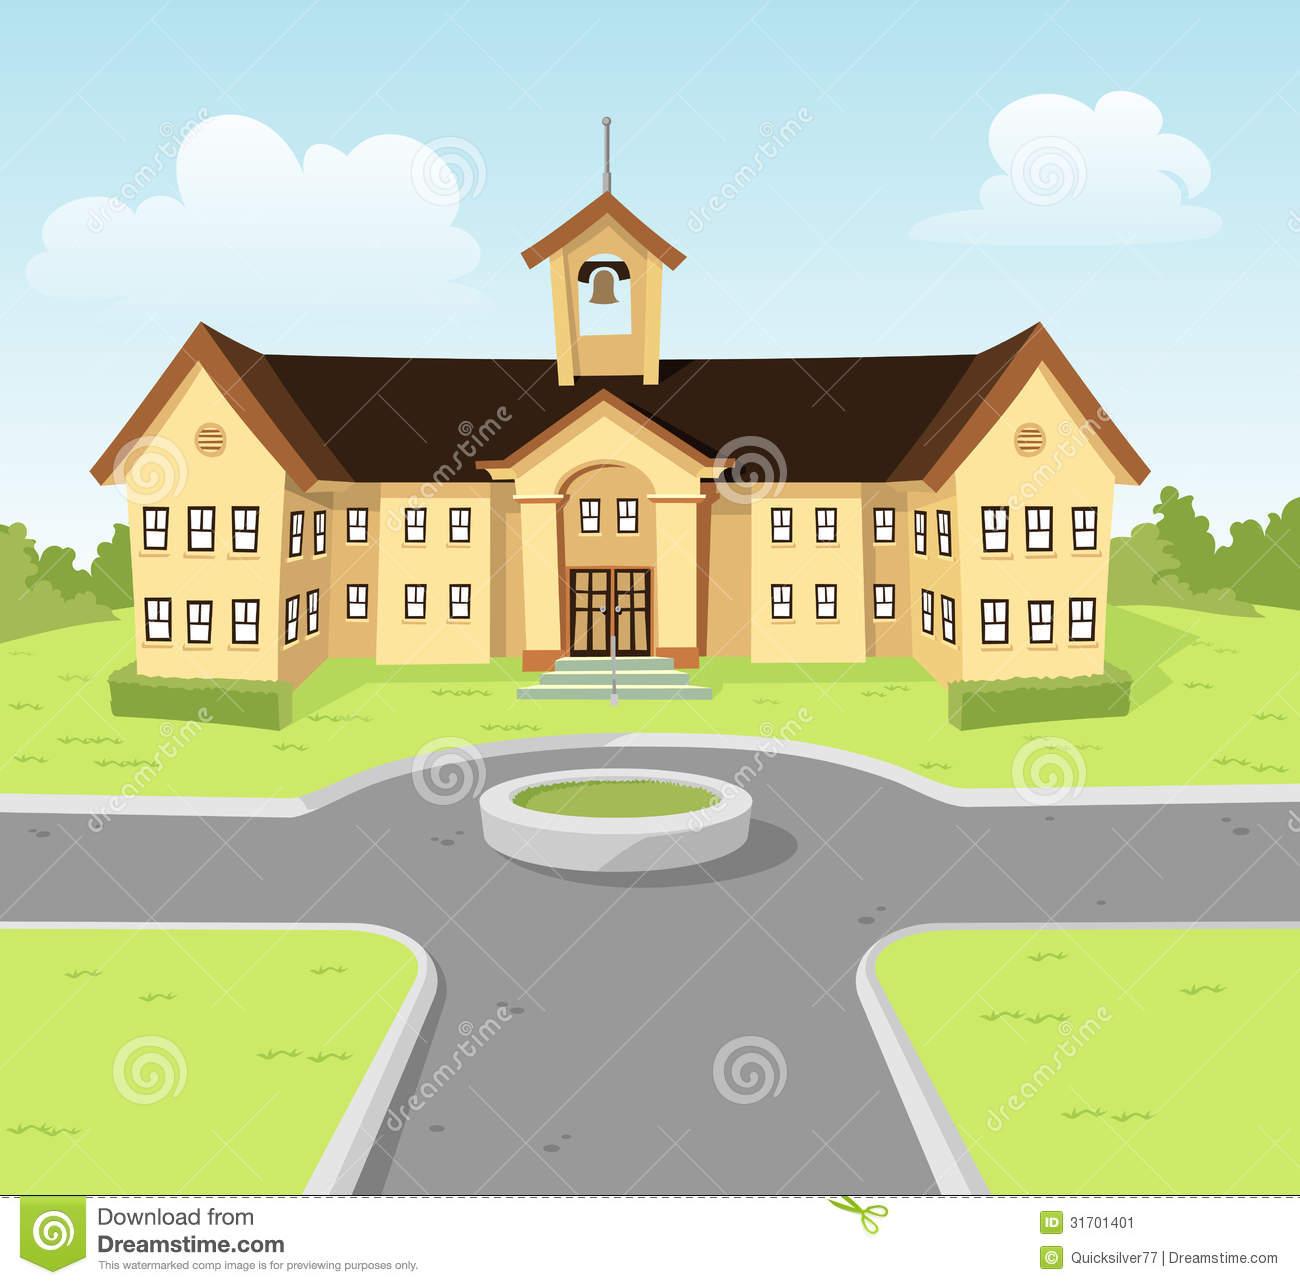 Buildings clipart university. School building stock image